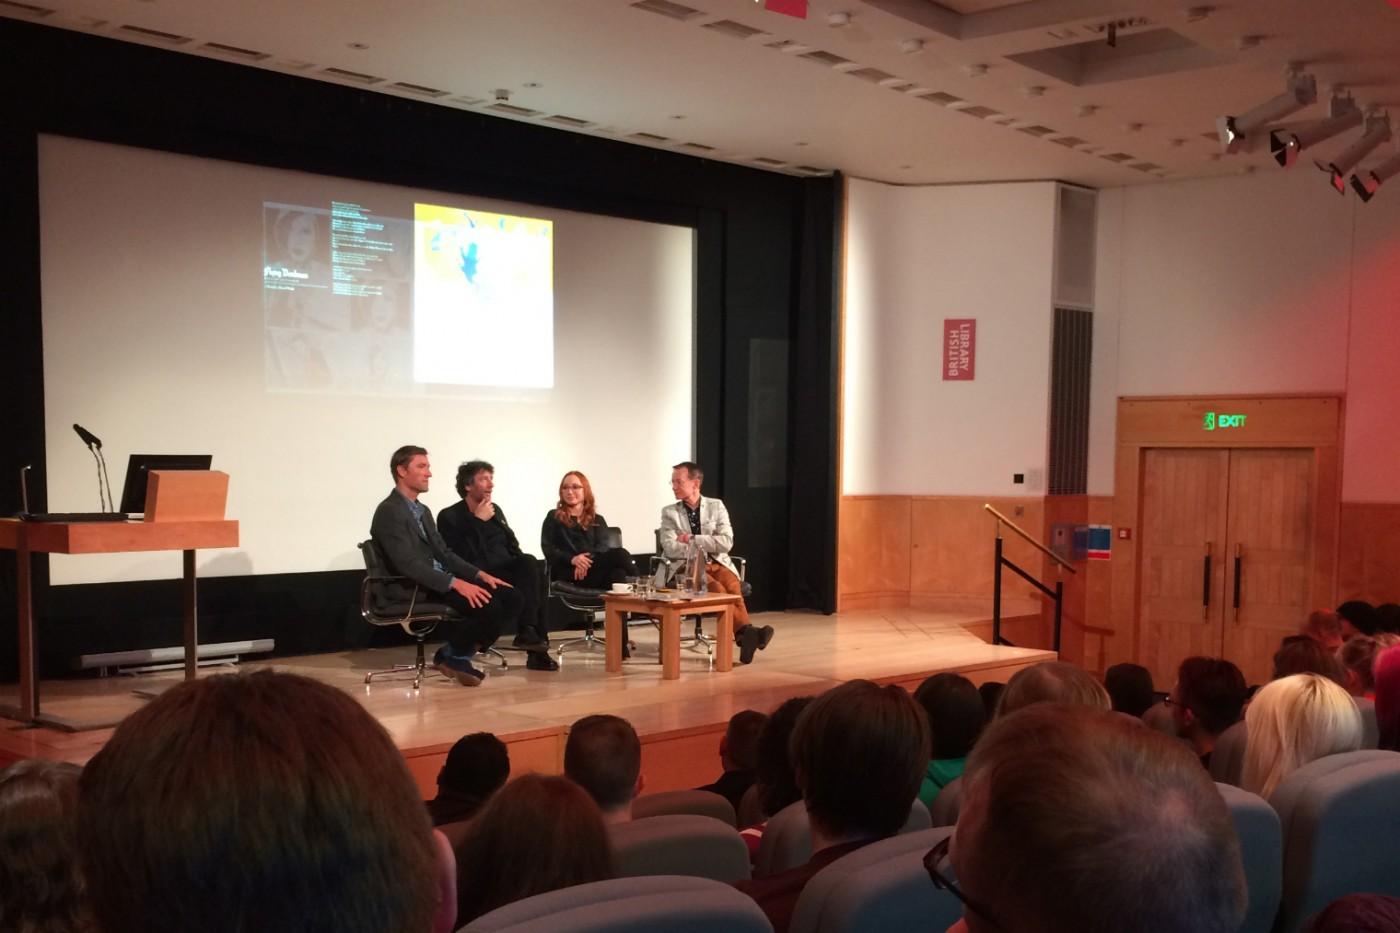 Neil Gaiman e Tori Amos na British Library